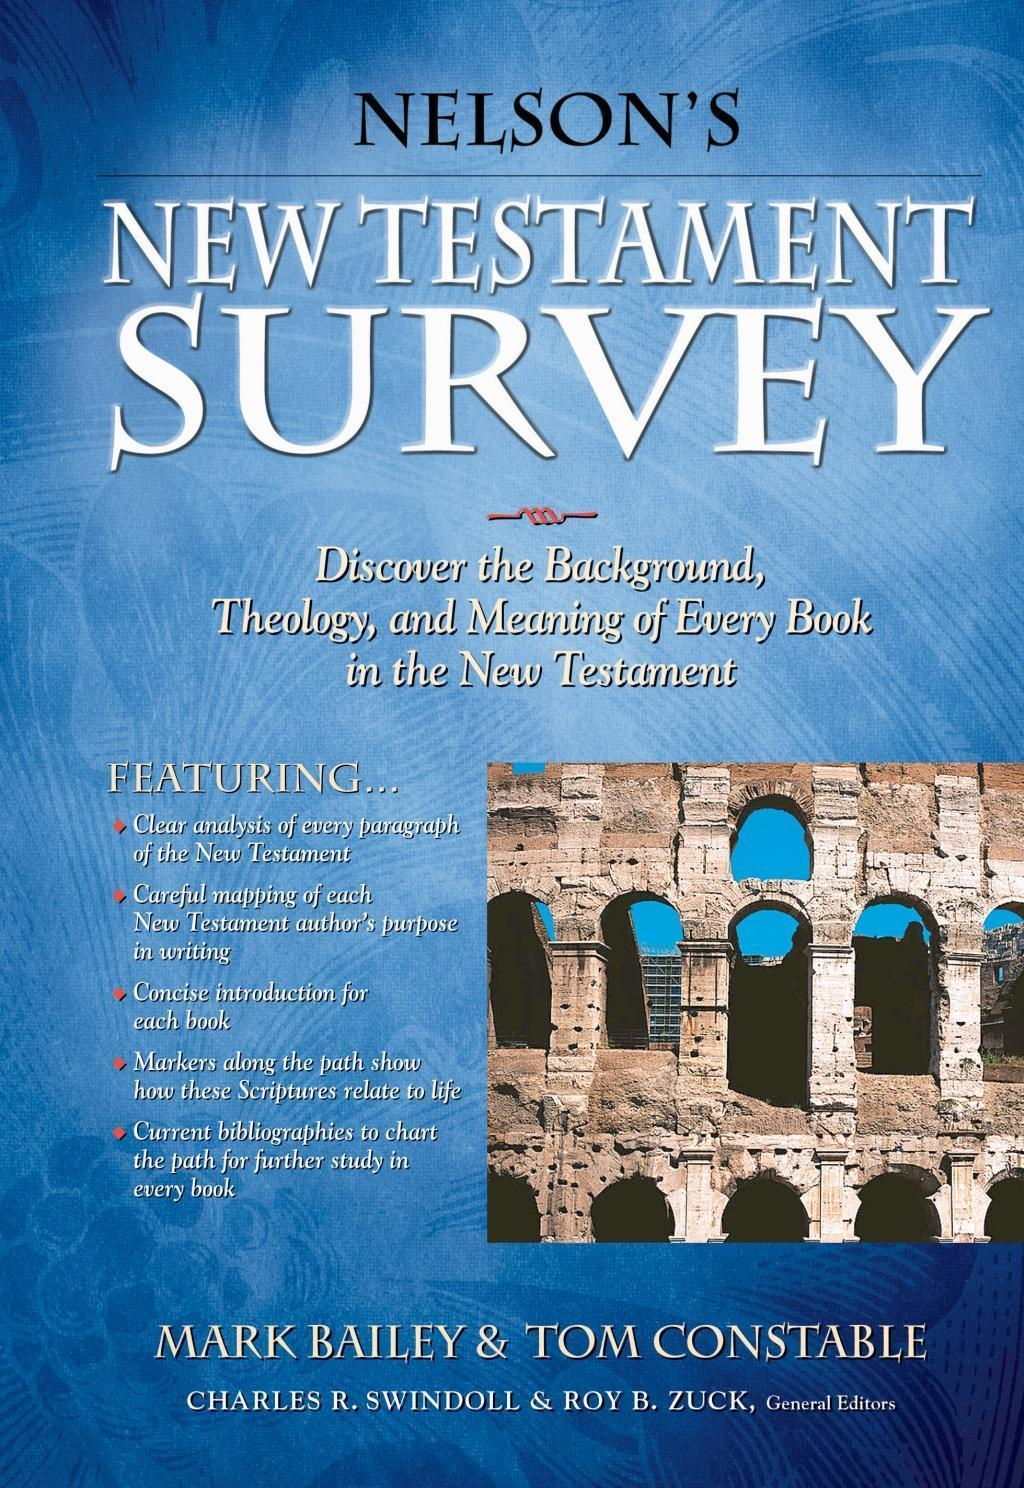 Nelson's New Testament Survey